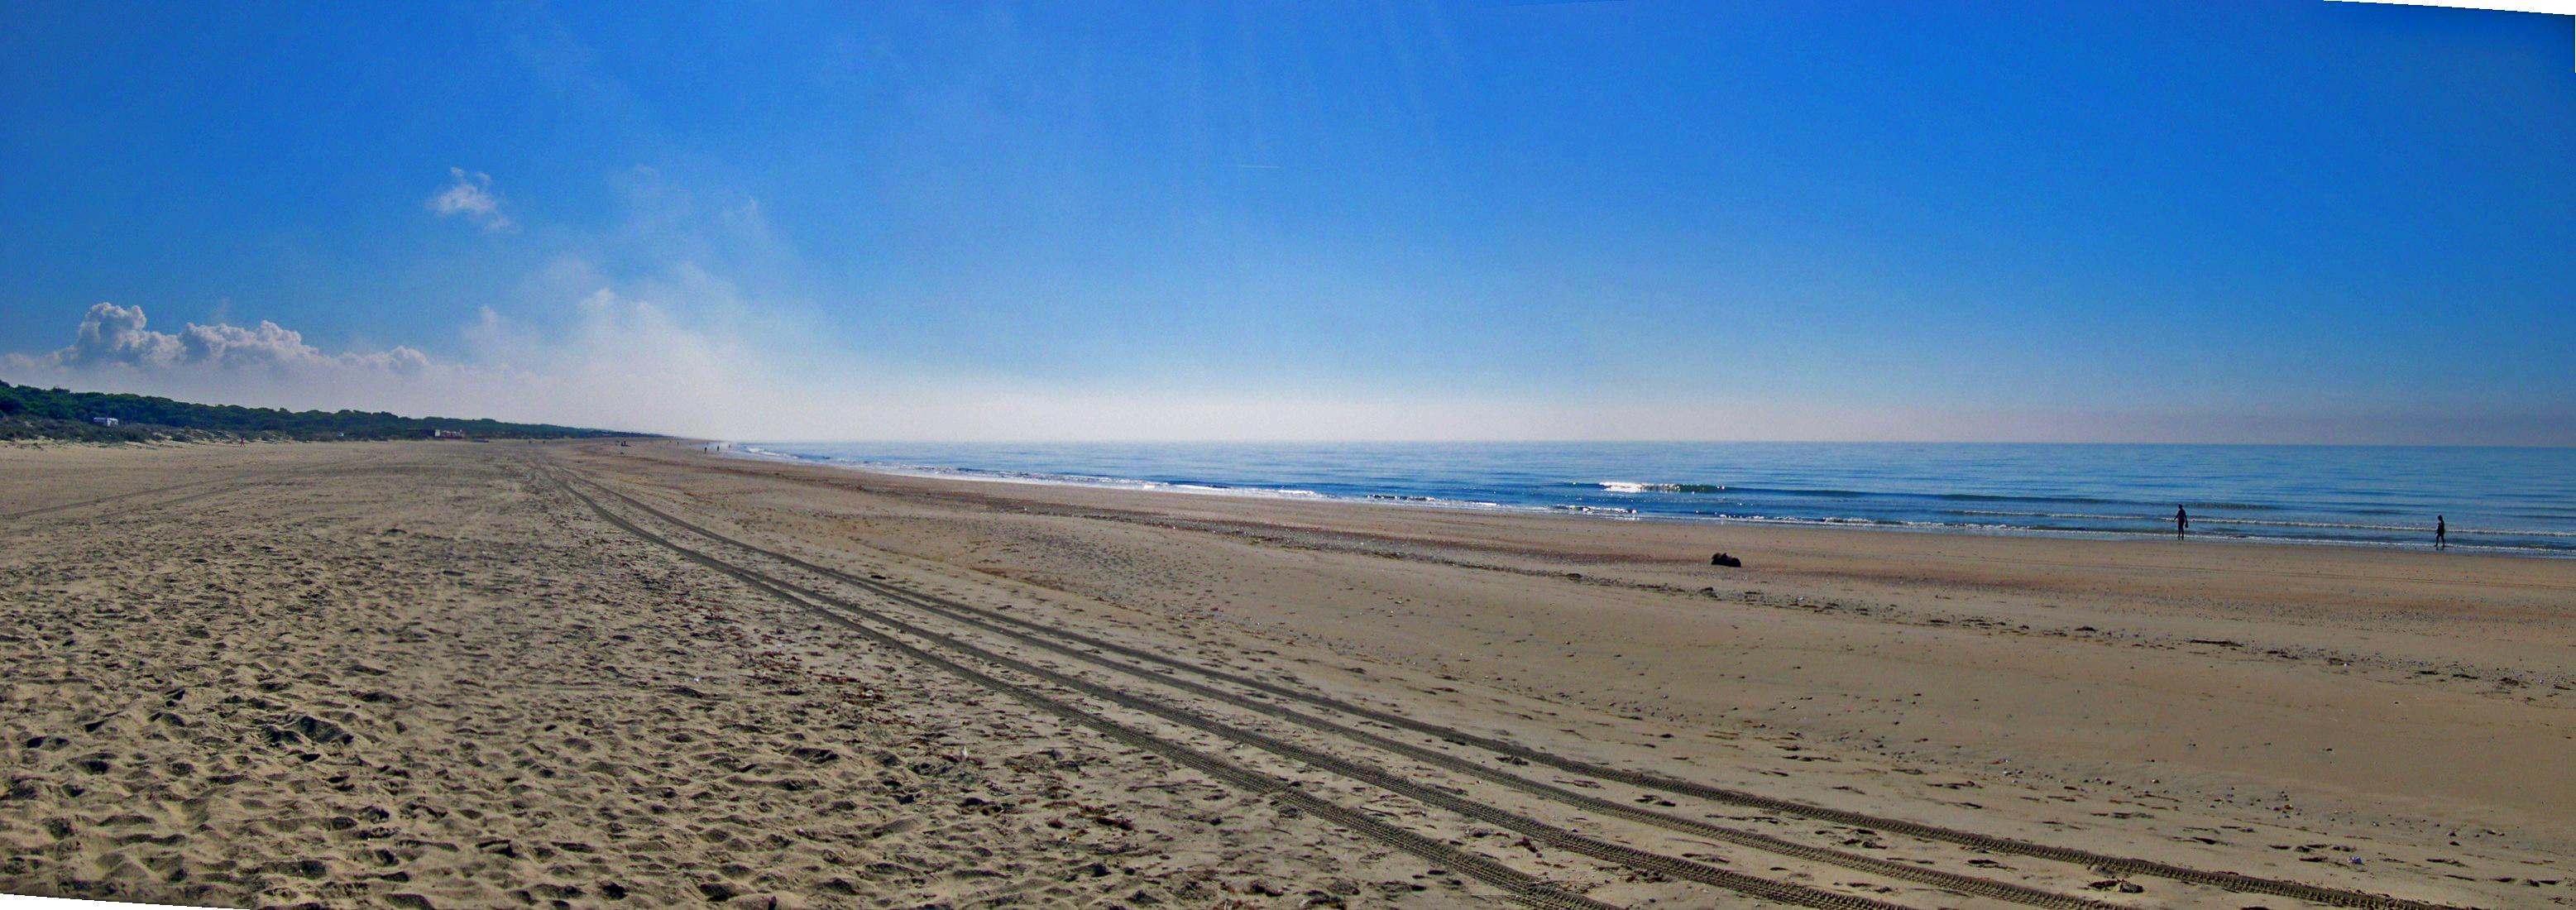 Foto playa La Bota. ¡Que páz!